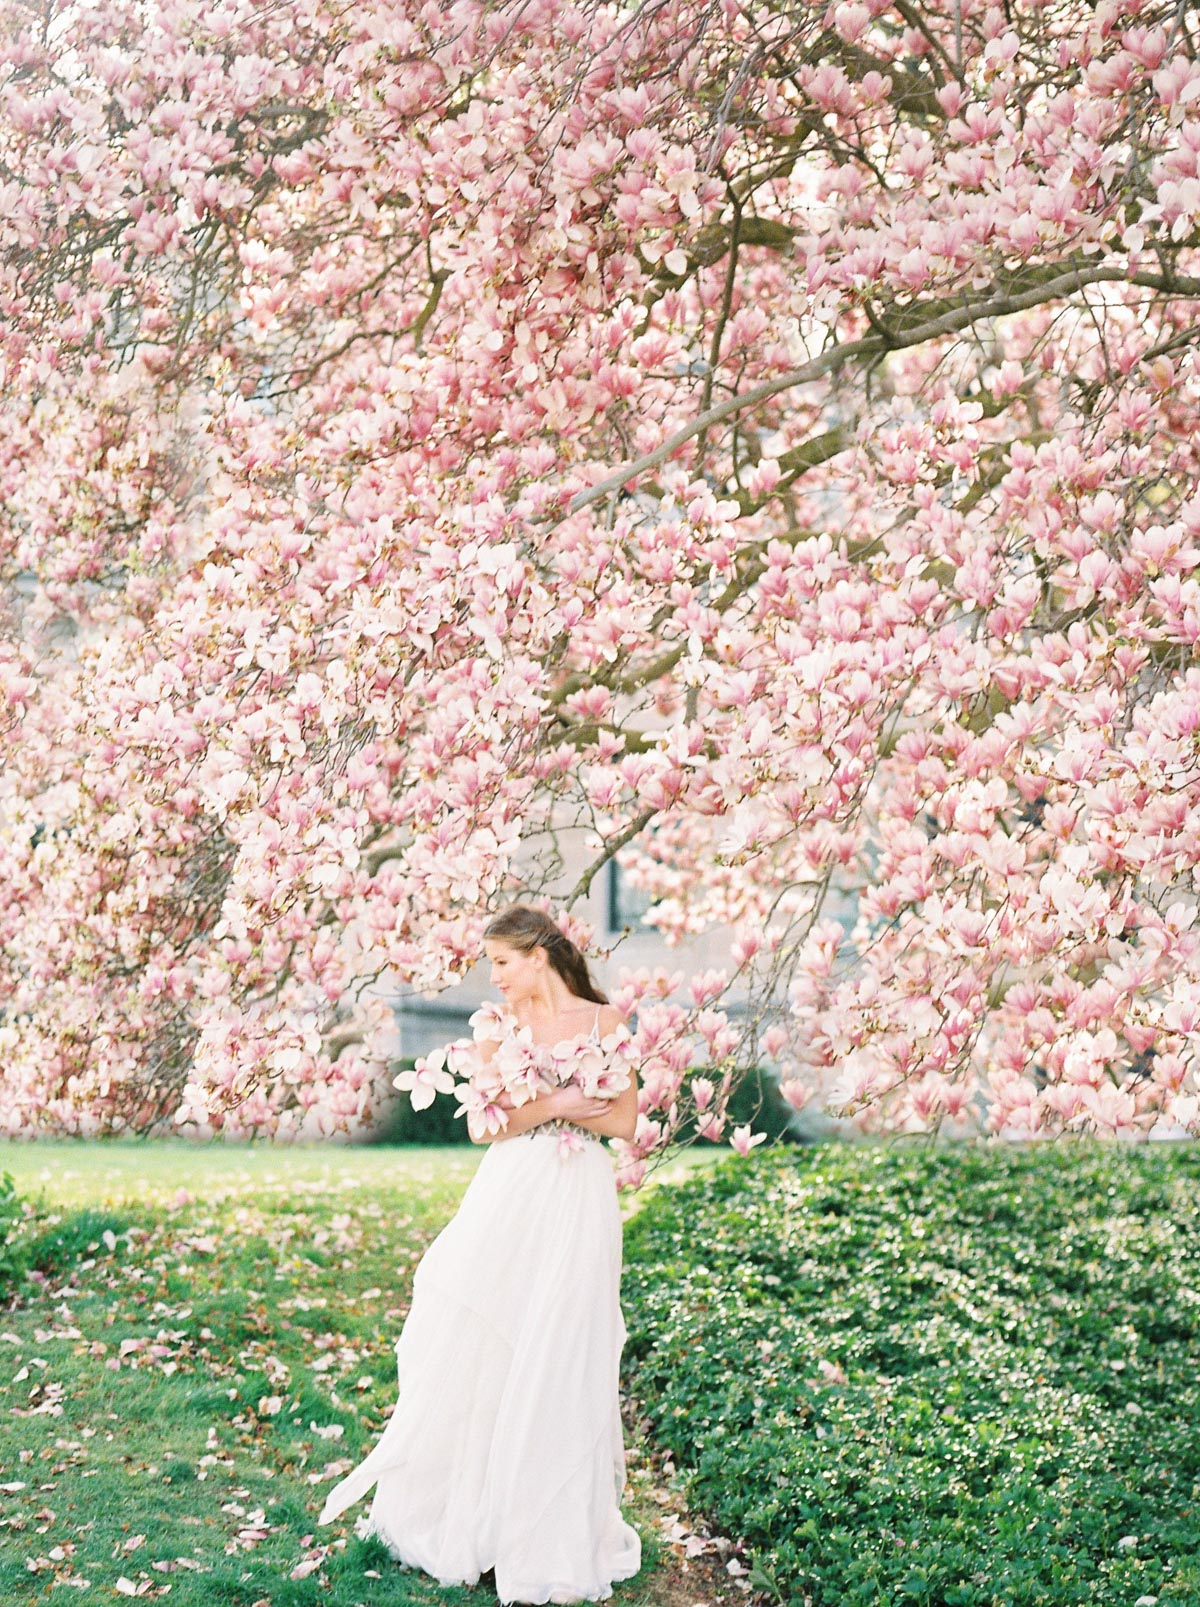 julia-park-photography-vineyard-bride-swish-list-niagara-on-the-lake-wedding-editorial-27.jpg